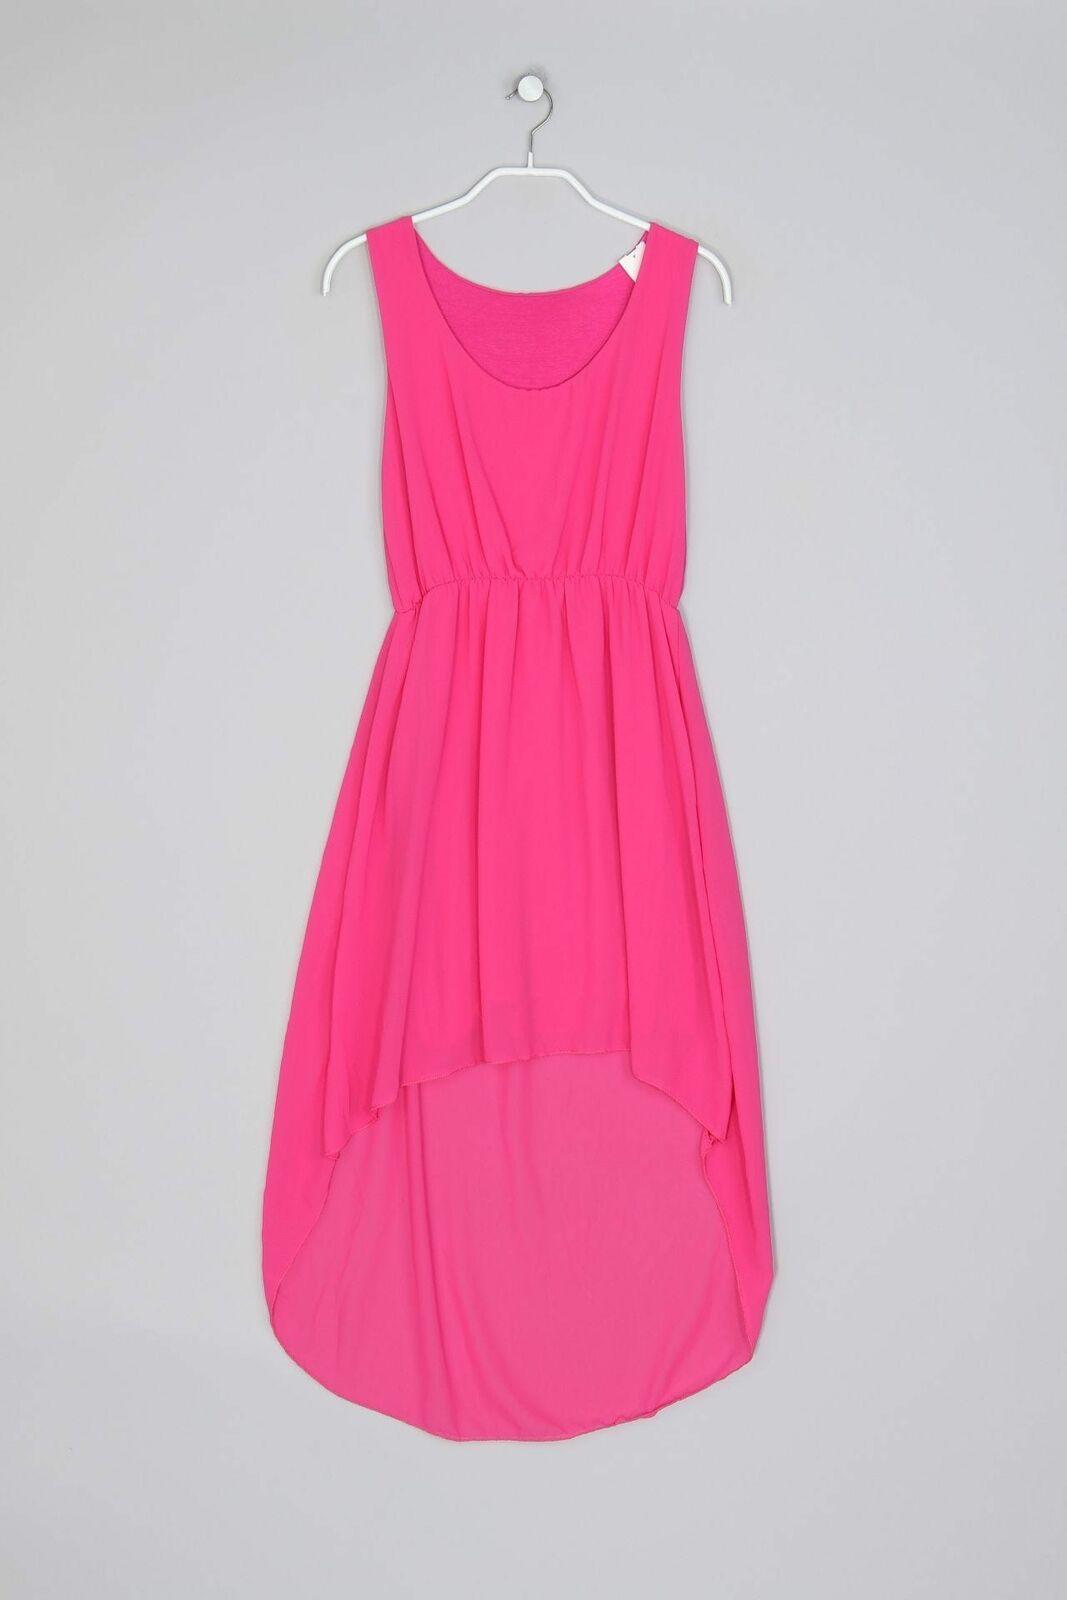 Vokuhila-Kleid S pink Damen Dress Robe in 12  Pinkes kleid